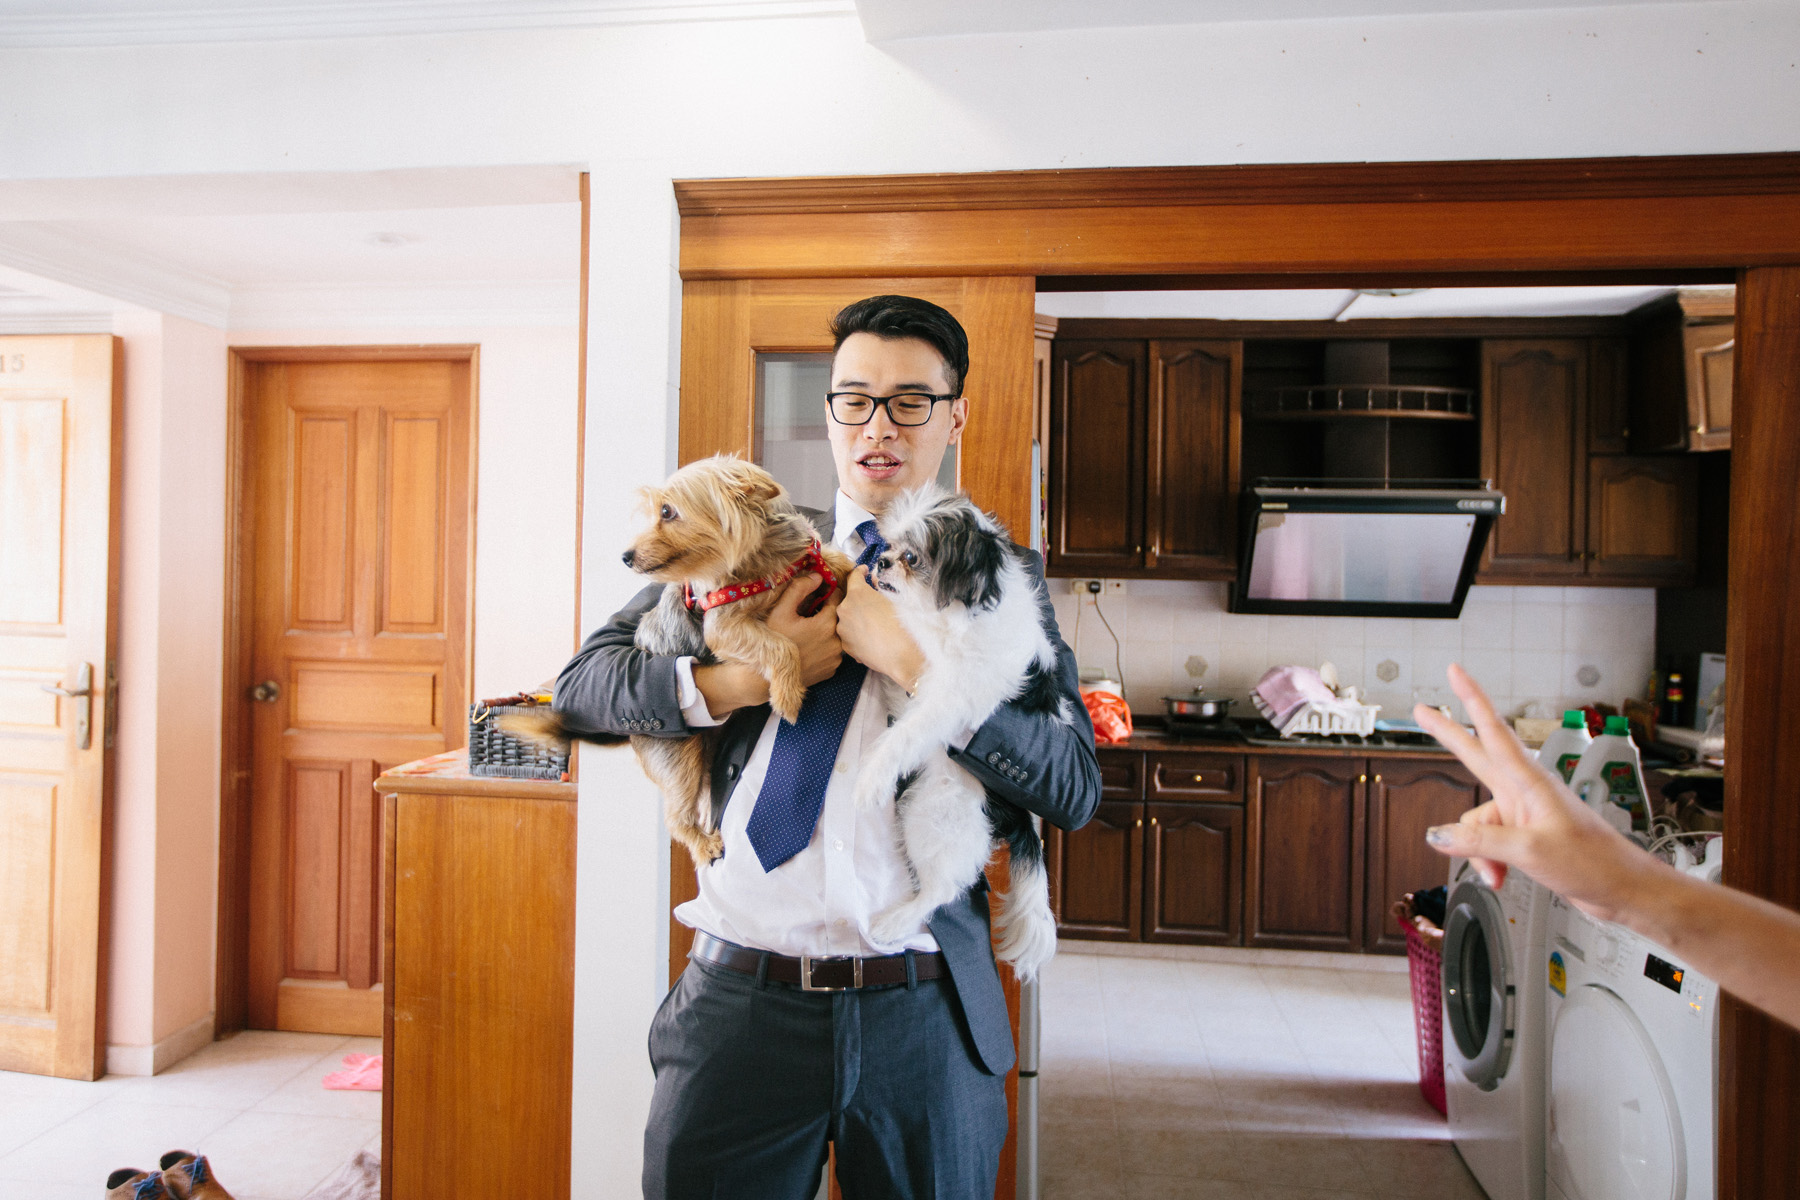 singapore-wedding-travel-photographer-faith-alvin-wedding-wmt-13.jpg